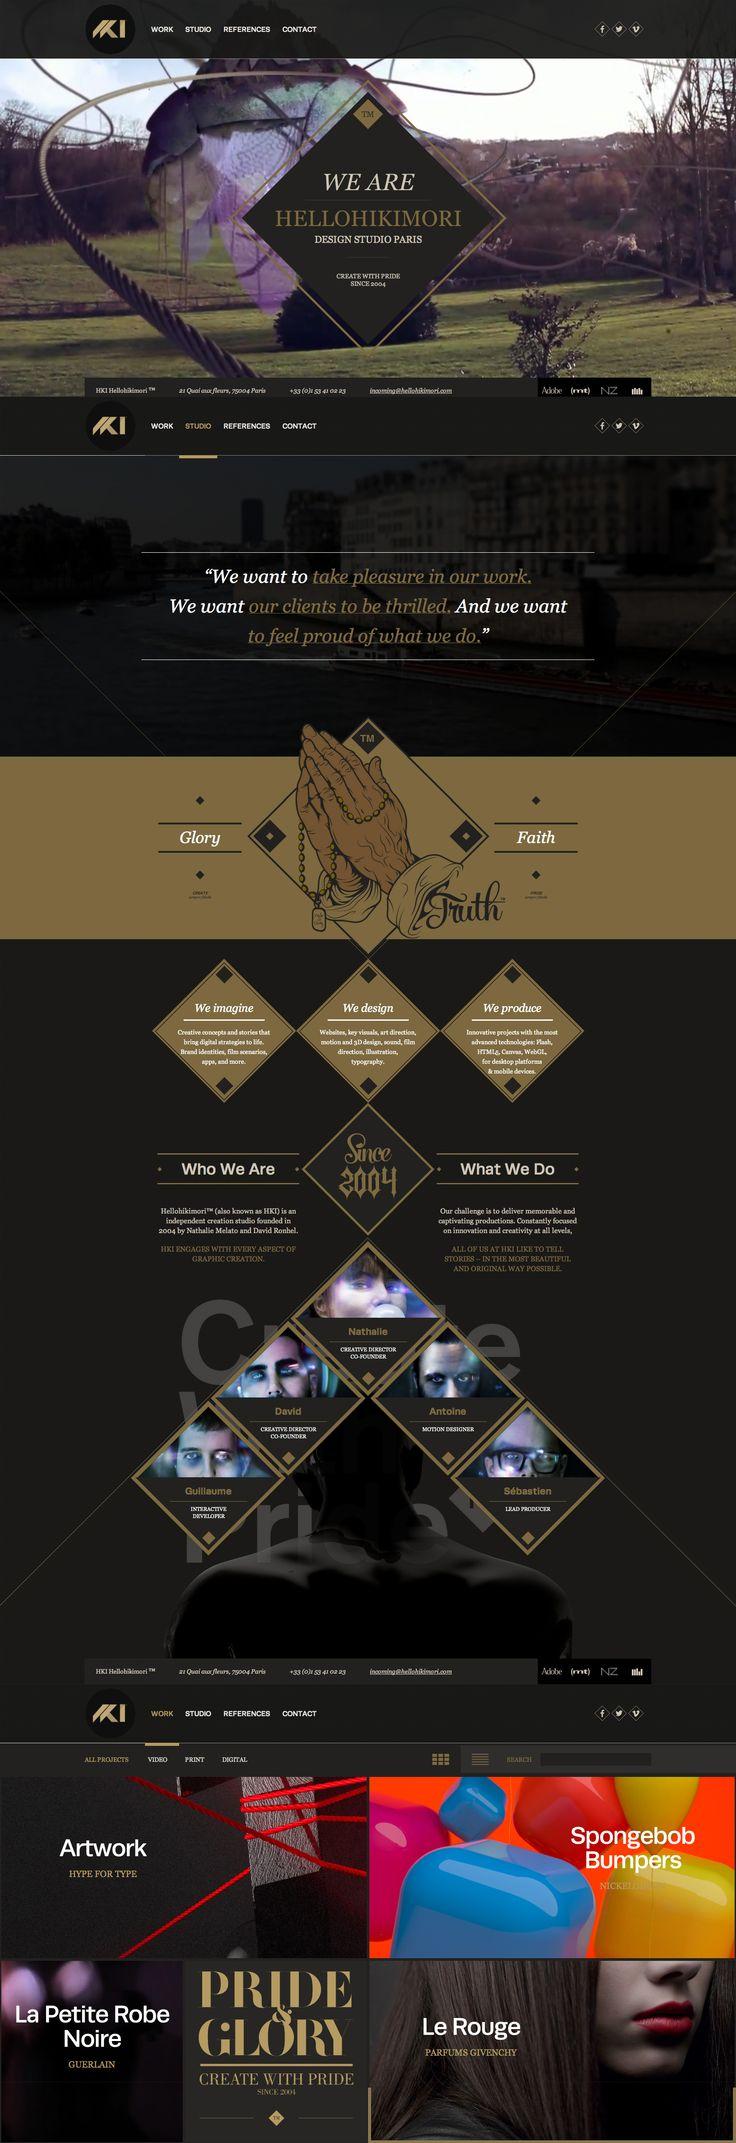 HKI™ Hellohikimori™, 9 August 2013. http://www.awwwards.com/web-design-awards/hki-hellohikimori   #WebInteractive #ResponsiveDesign #HTML5 #Video #Design #Portfolio #GraphicDesign